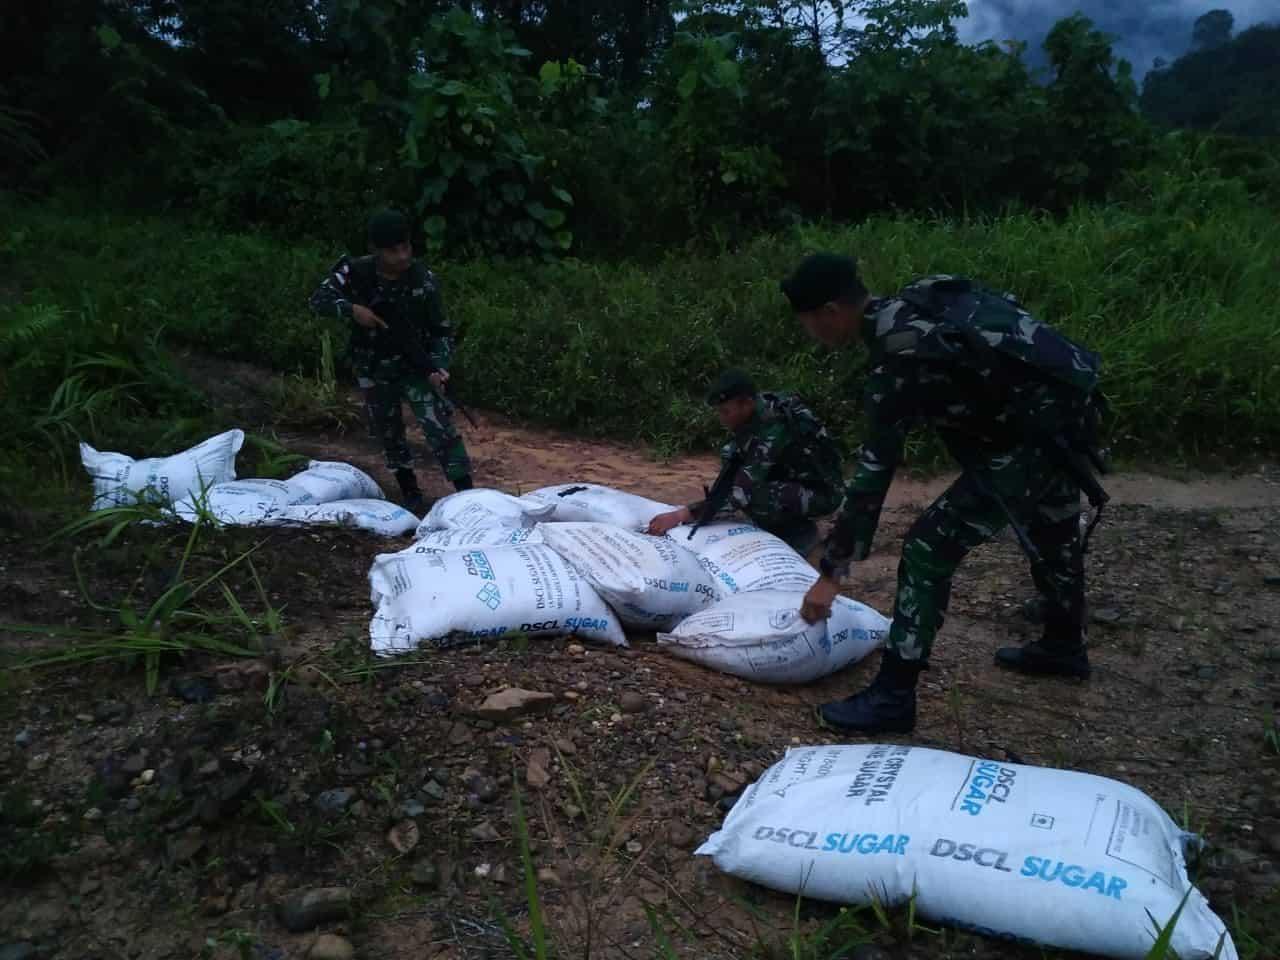 Satgas Pamtas Yonif Raider 641/Bru Gagalkan Penyelundupan 1500 kg Gula